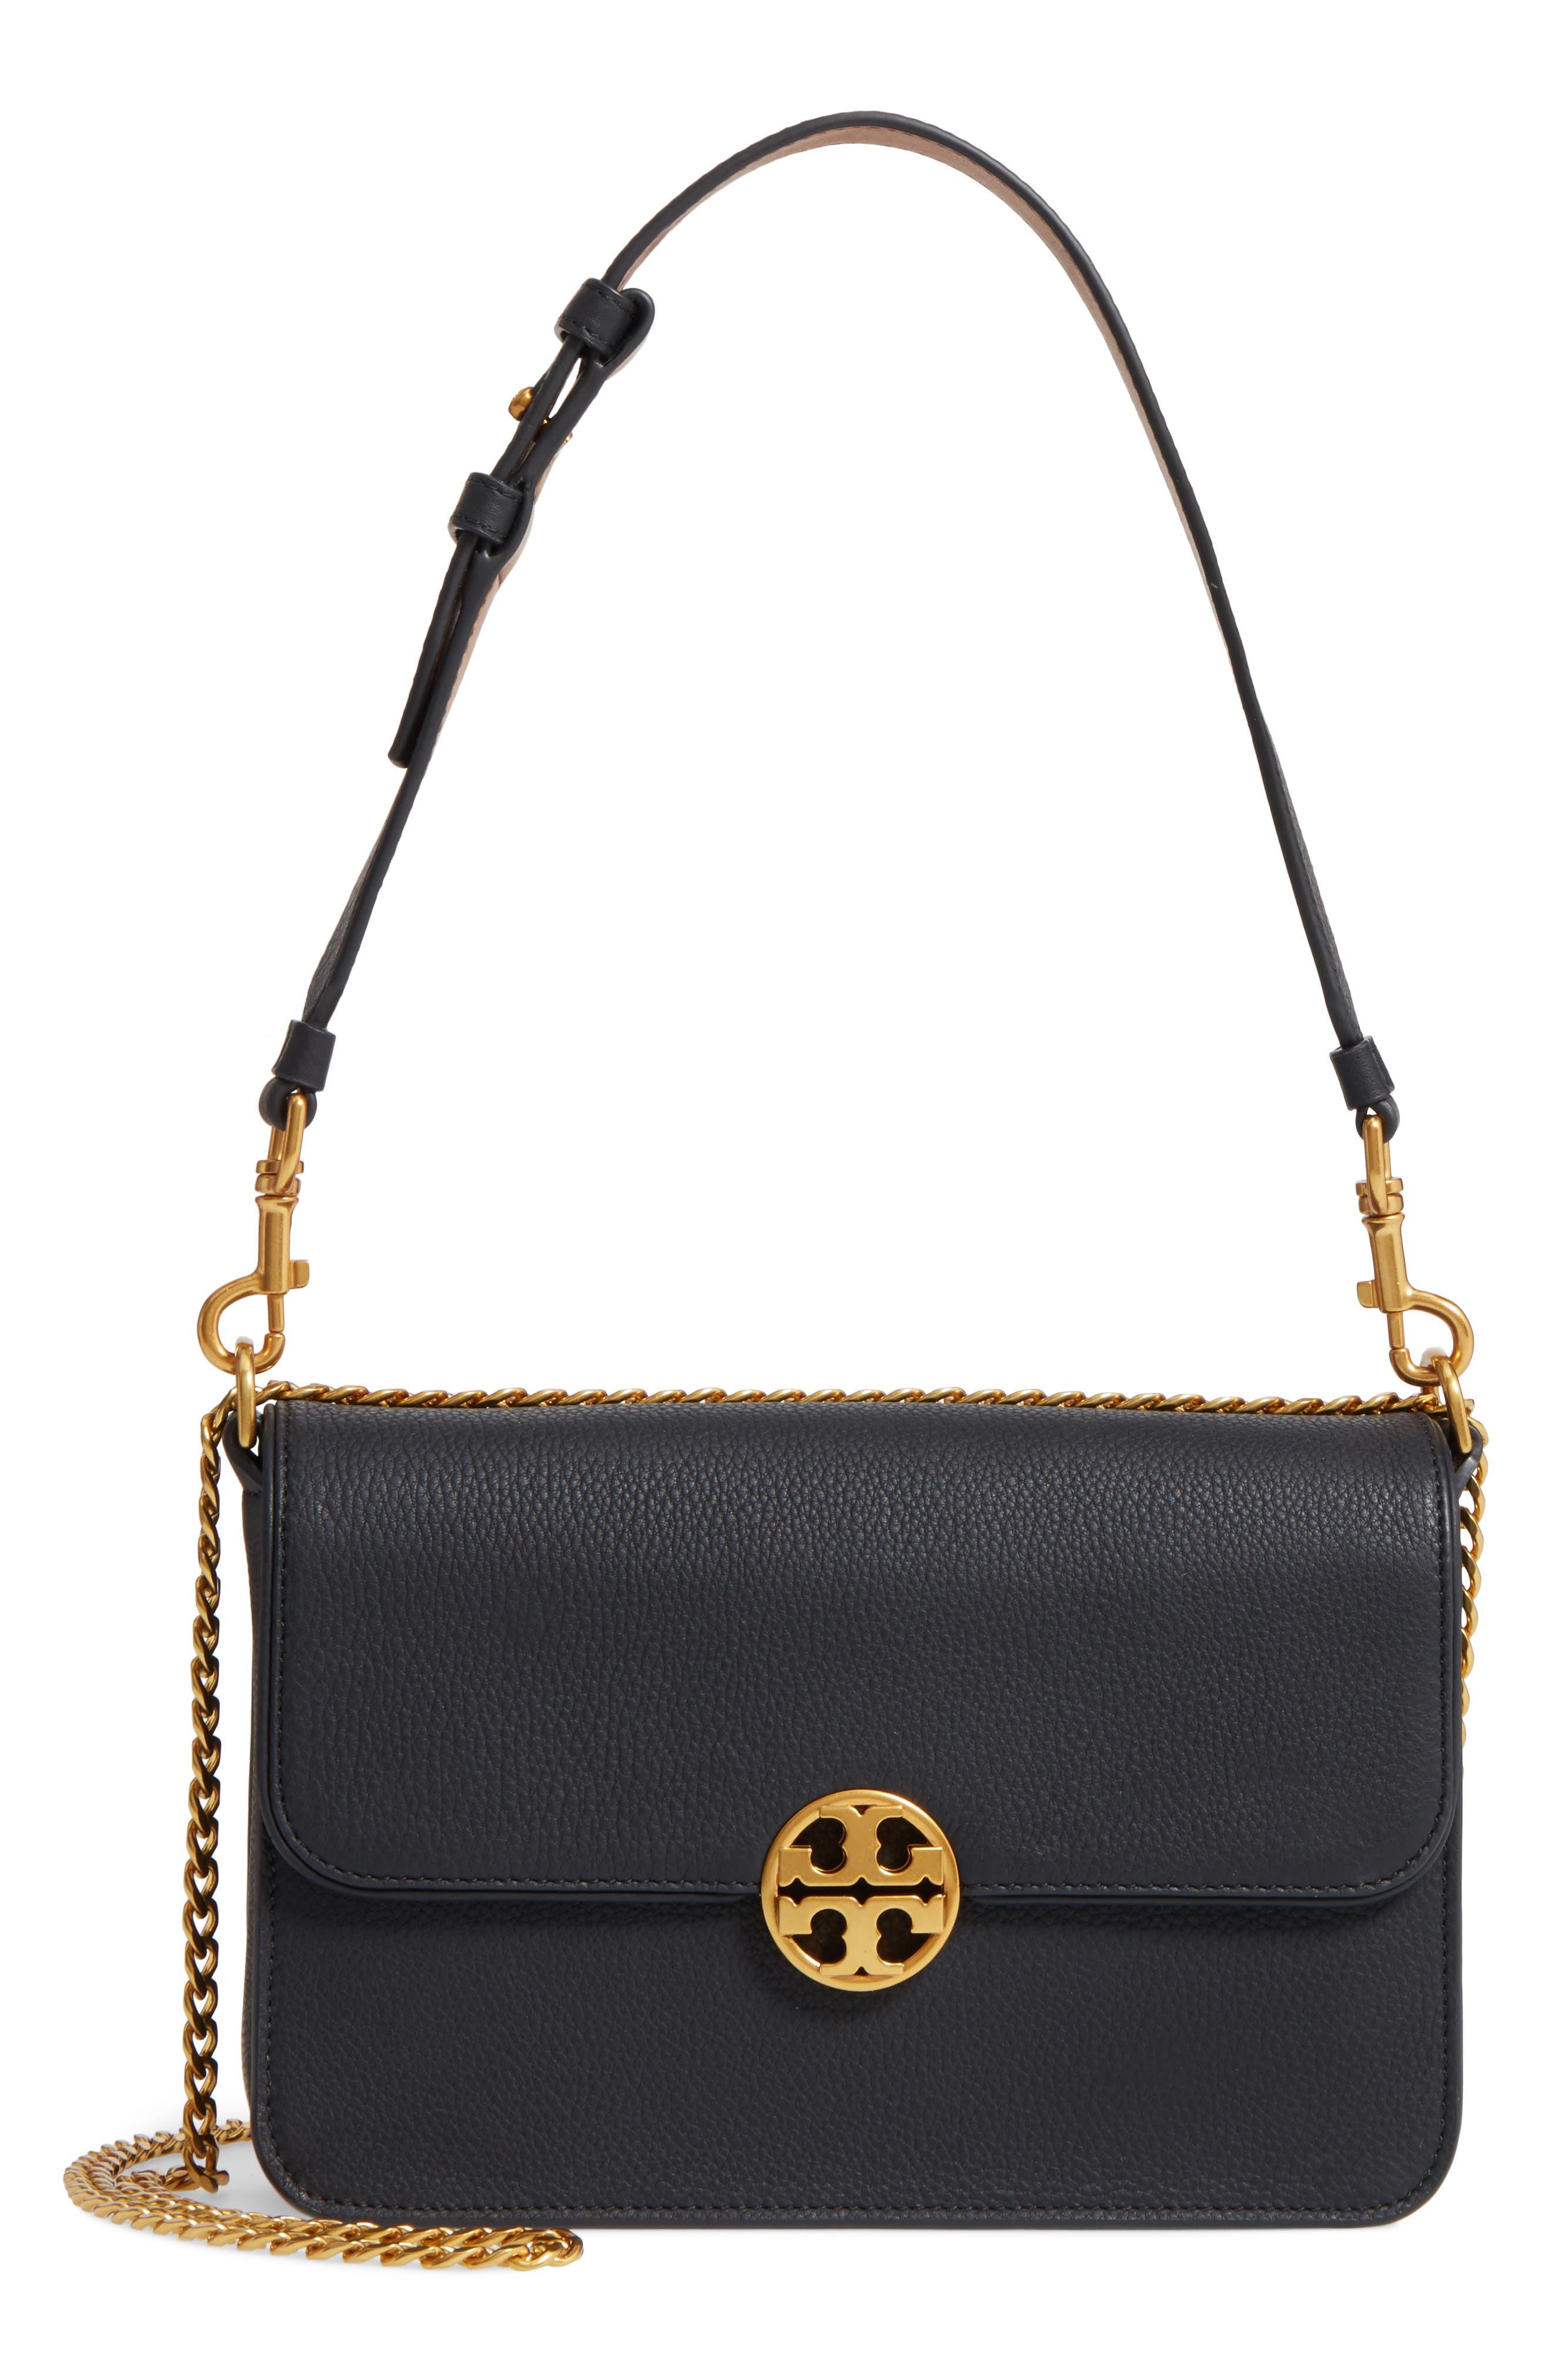 Chelsea Leather Shoulder Bag,                             Main thumbnail 1, color,                             001